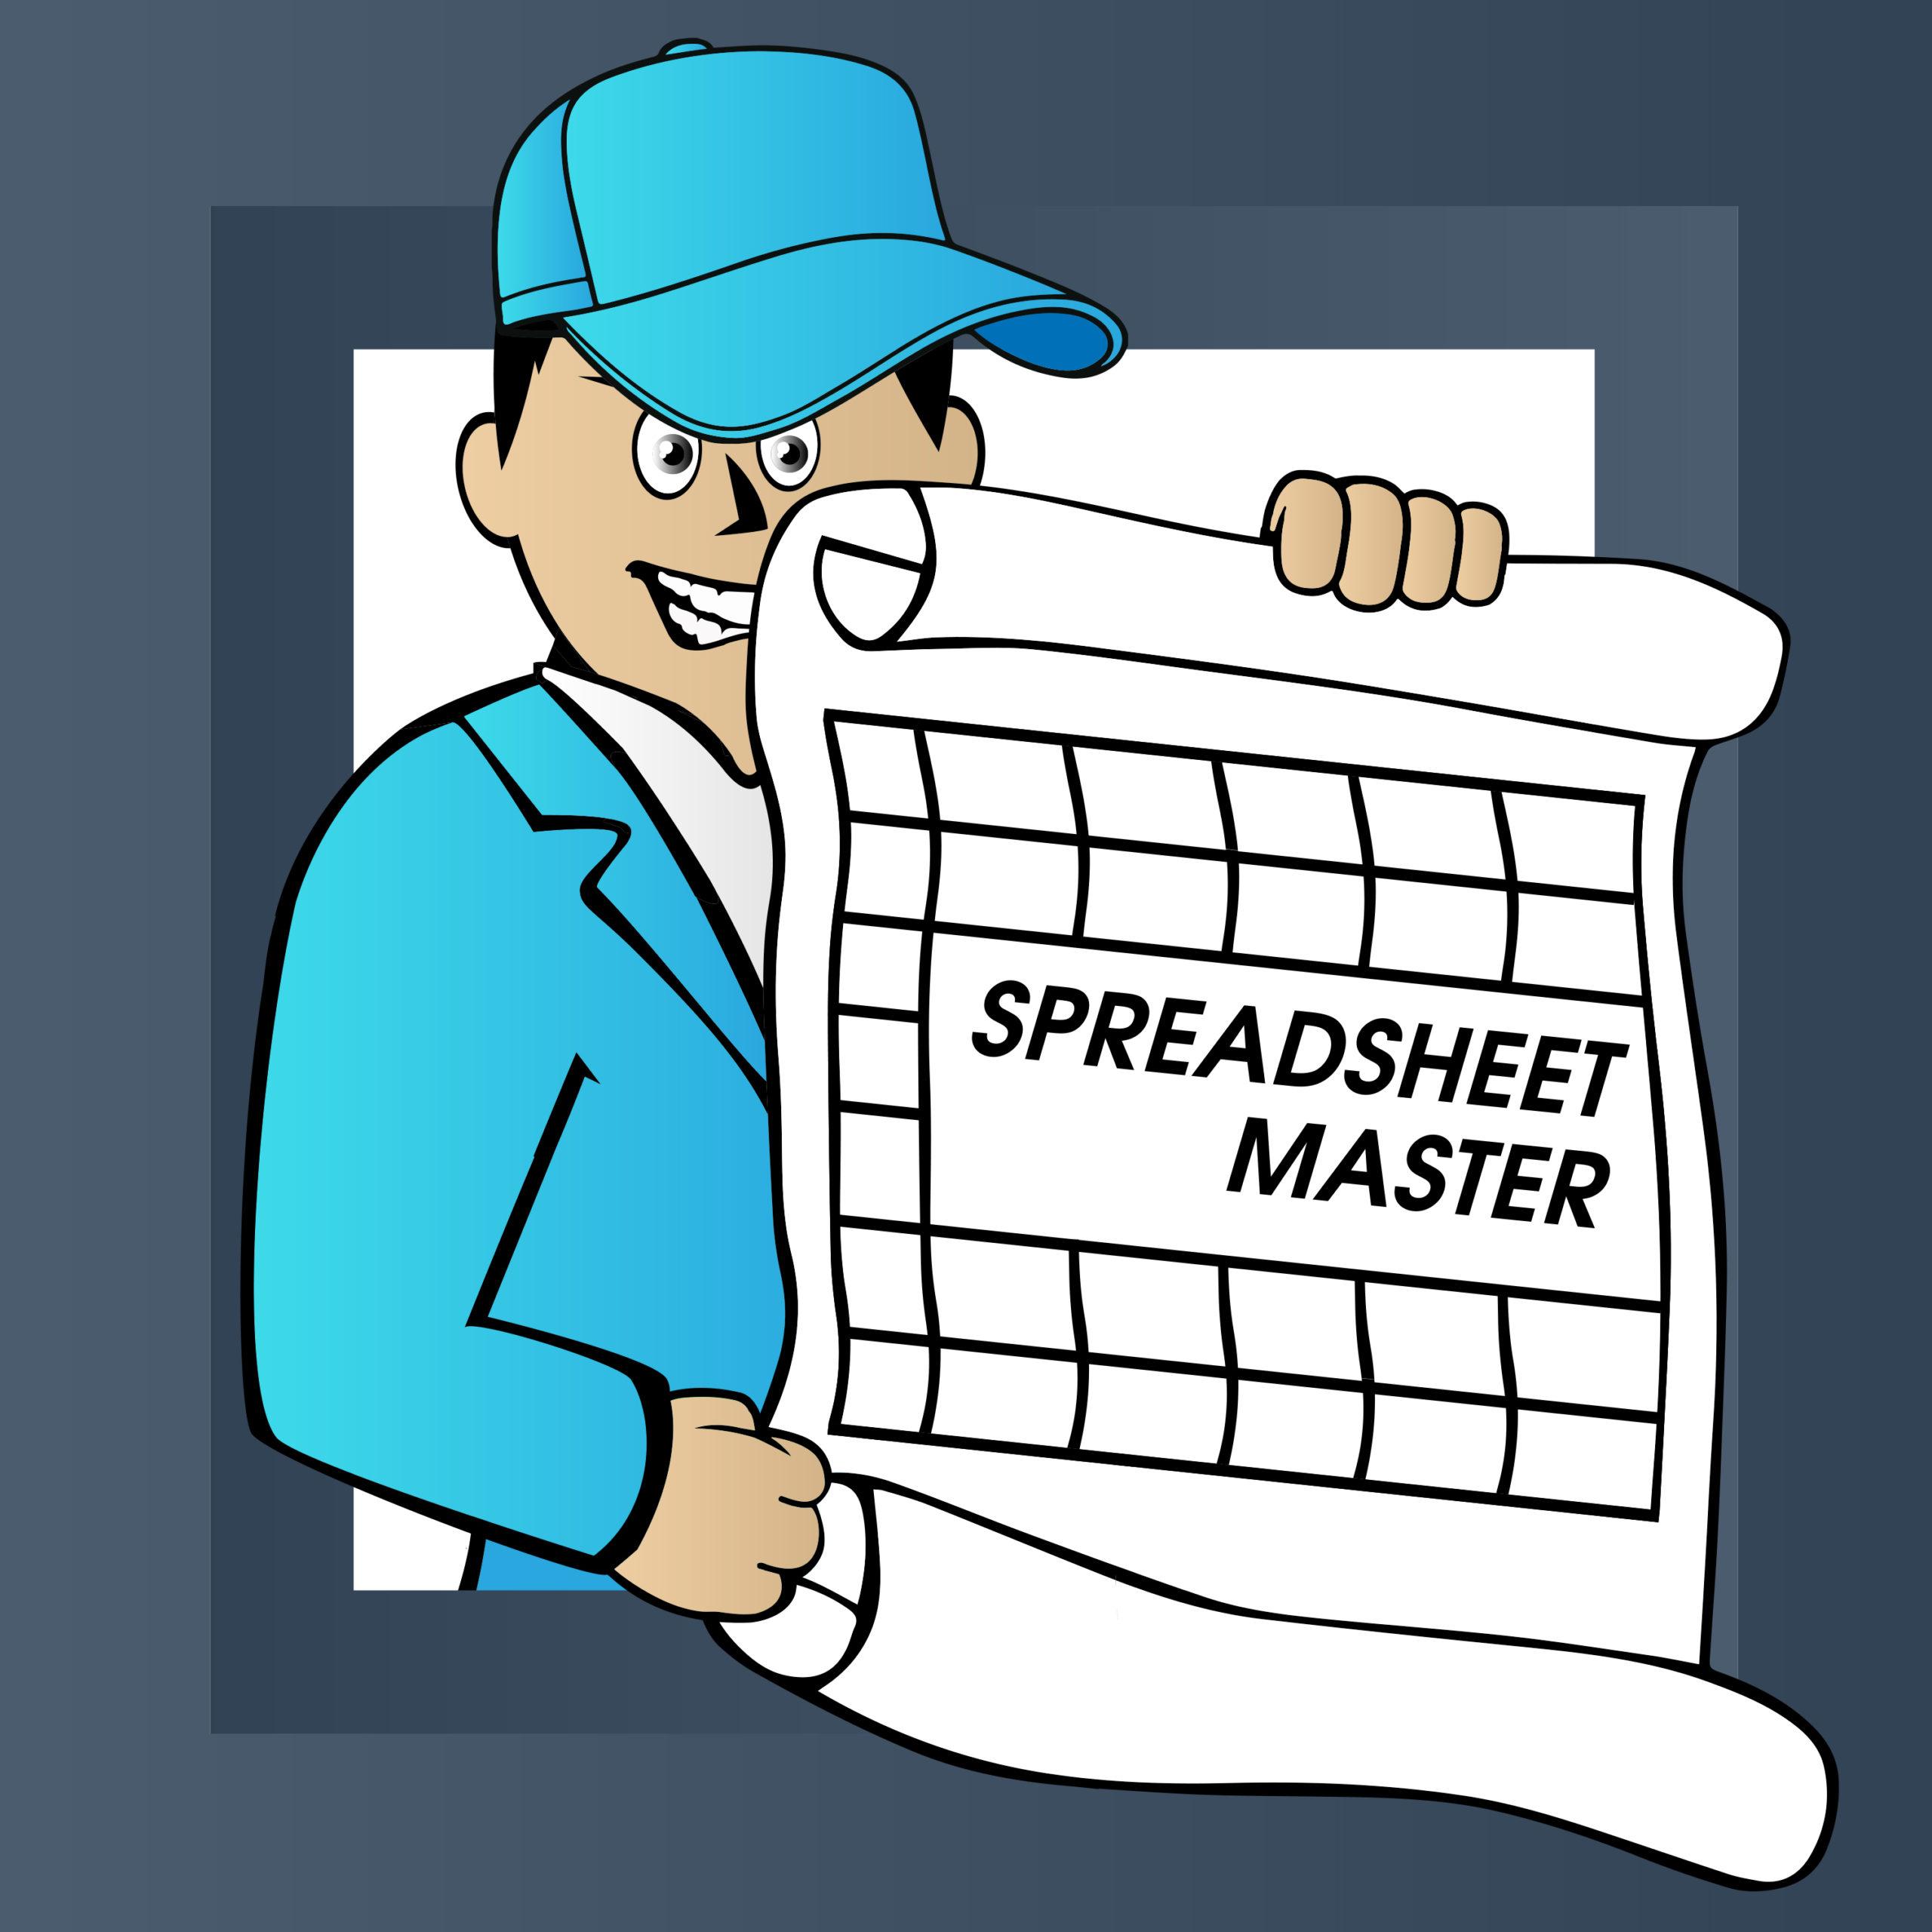 Spreadsheet Product Master